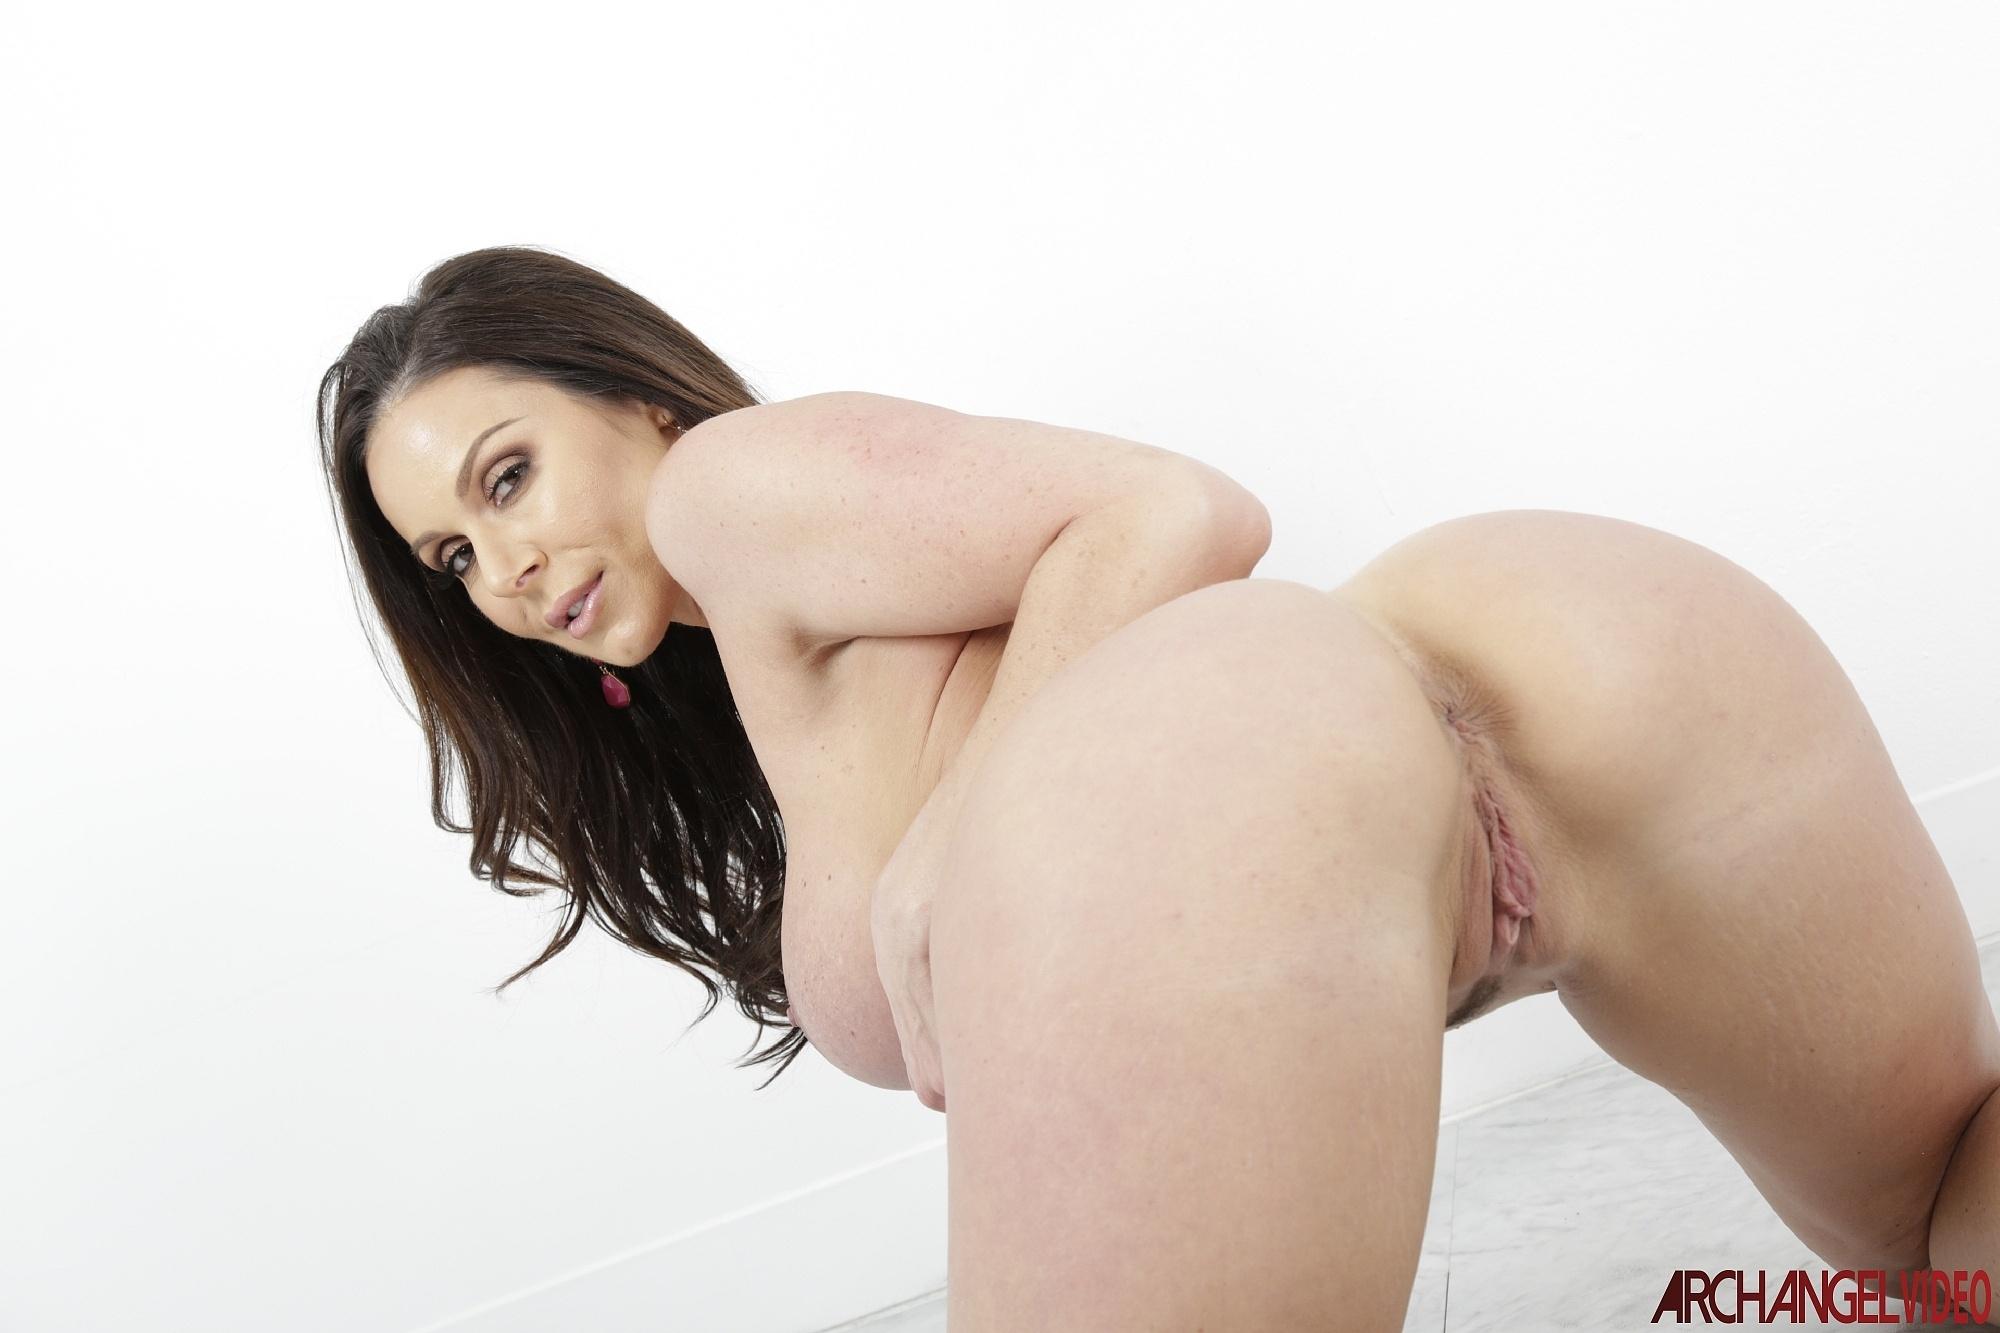 kendra Lust muestra su conchita fenomenal